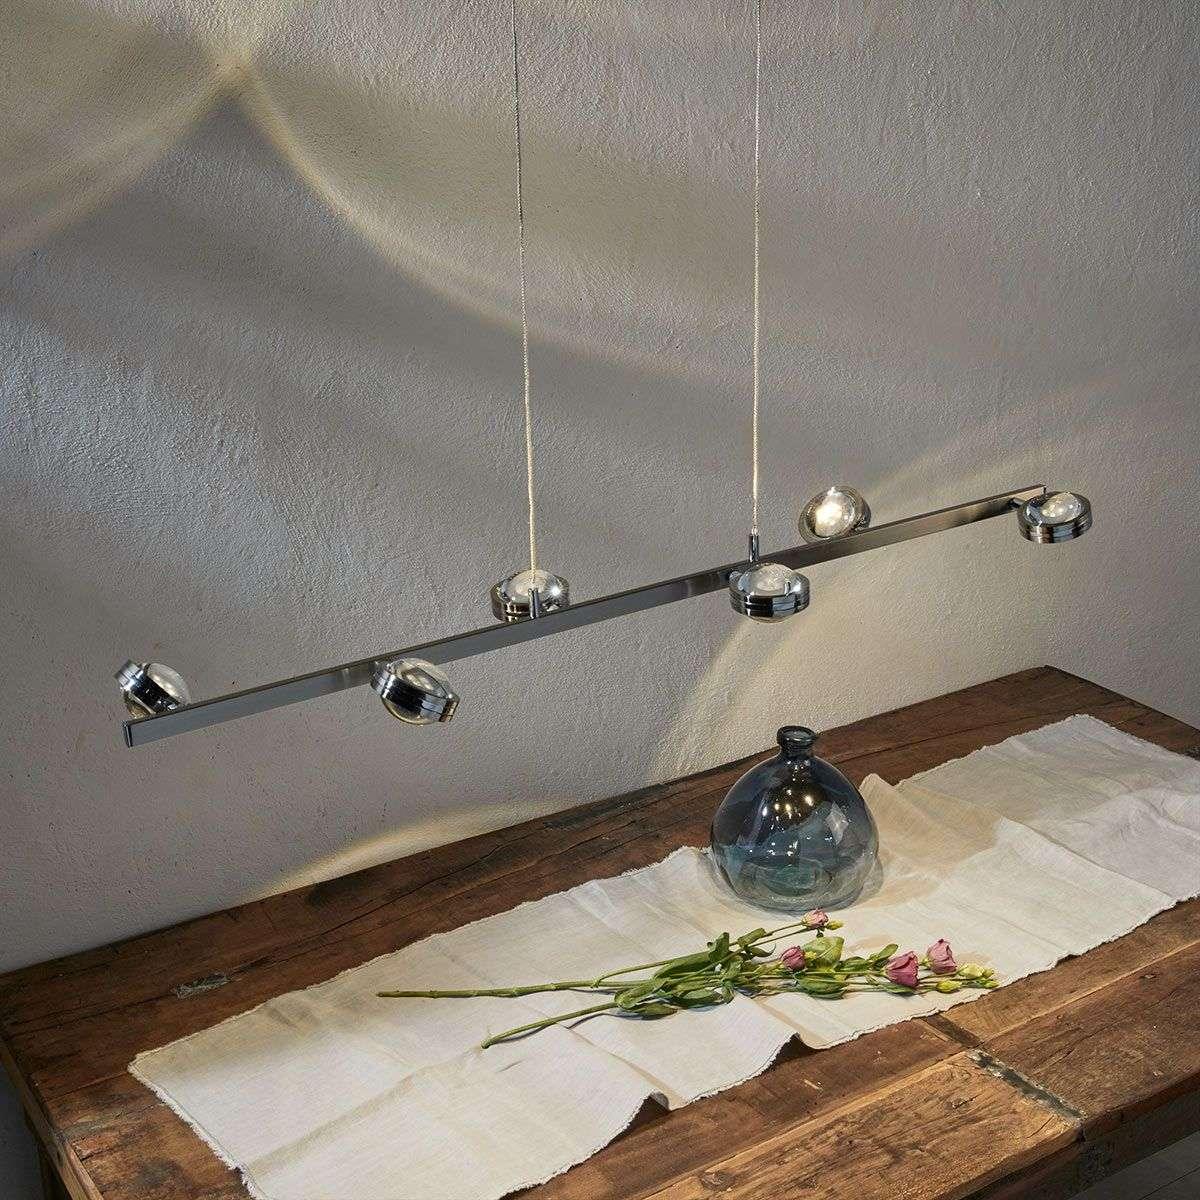 linear pendant lighting. Pablos Height-adjustable LED Linear Pendant Light-9994127-33 Lighting